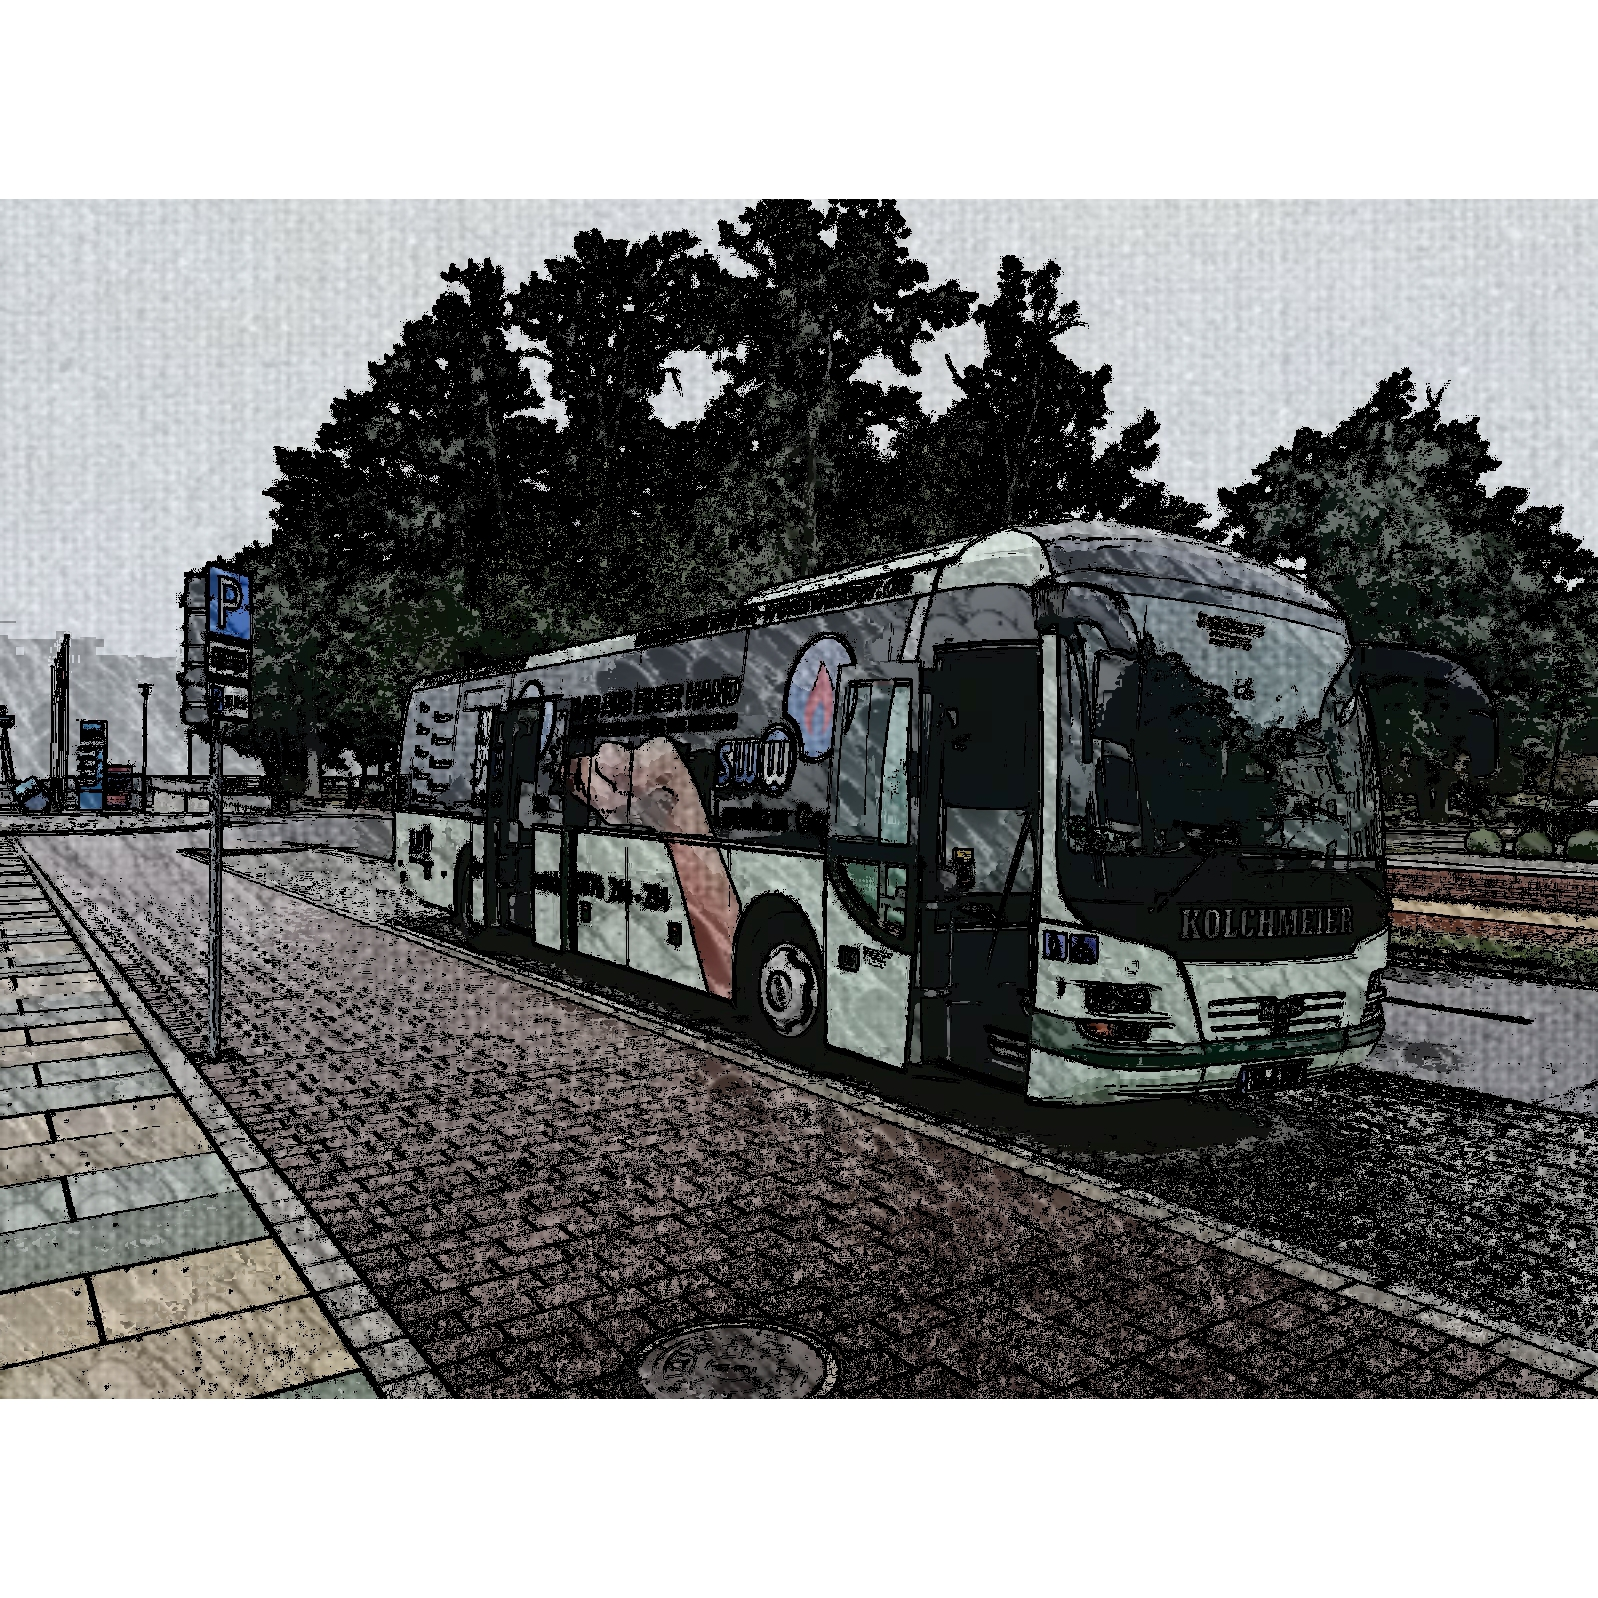 Busbetrieb Kolchmeier